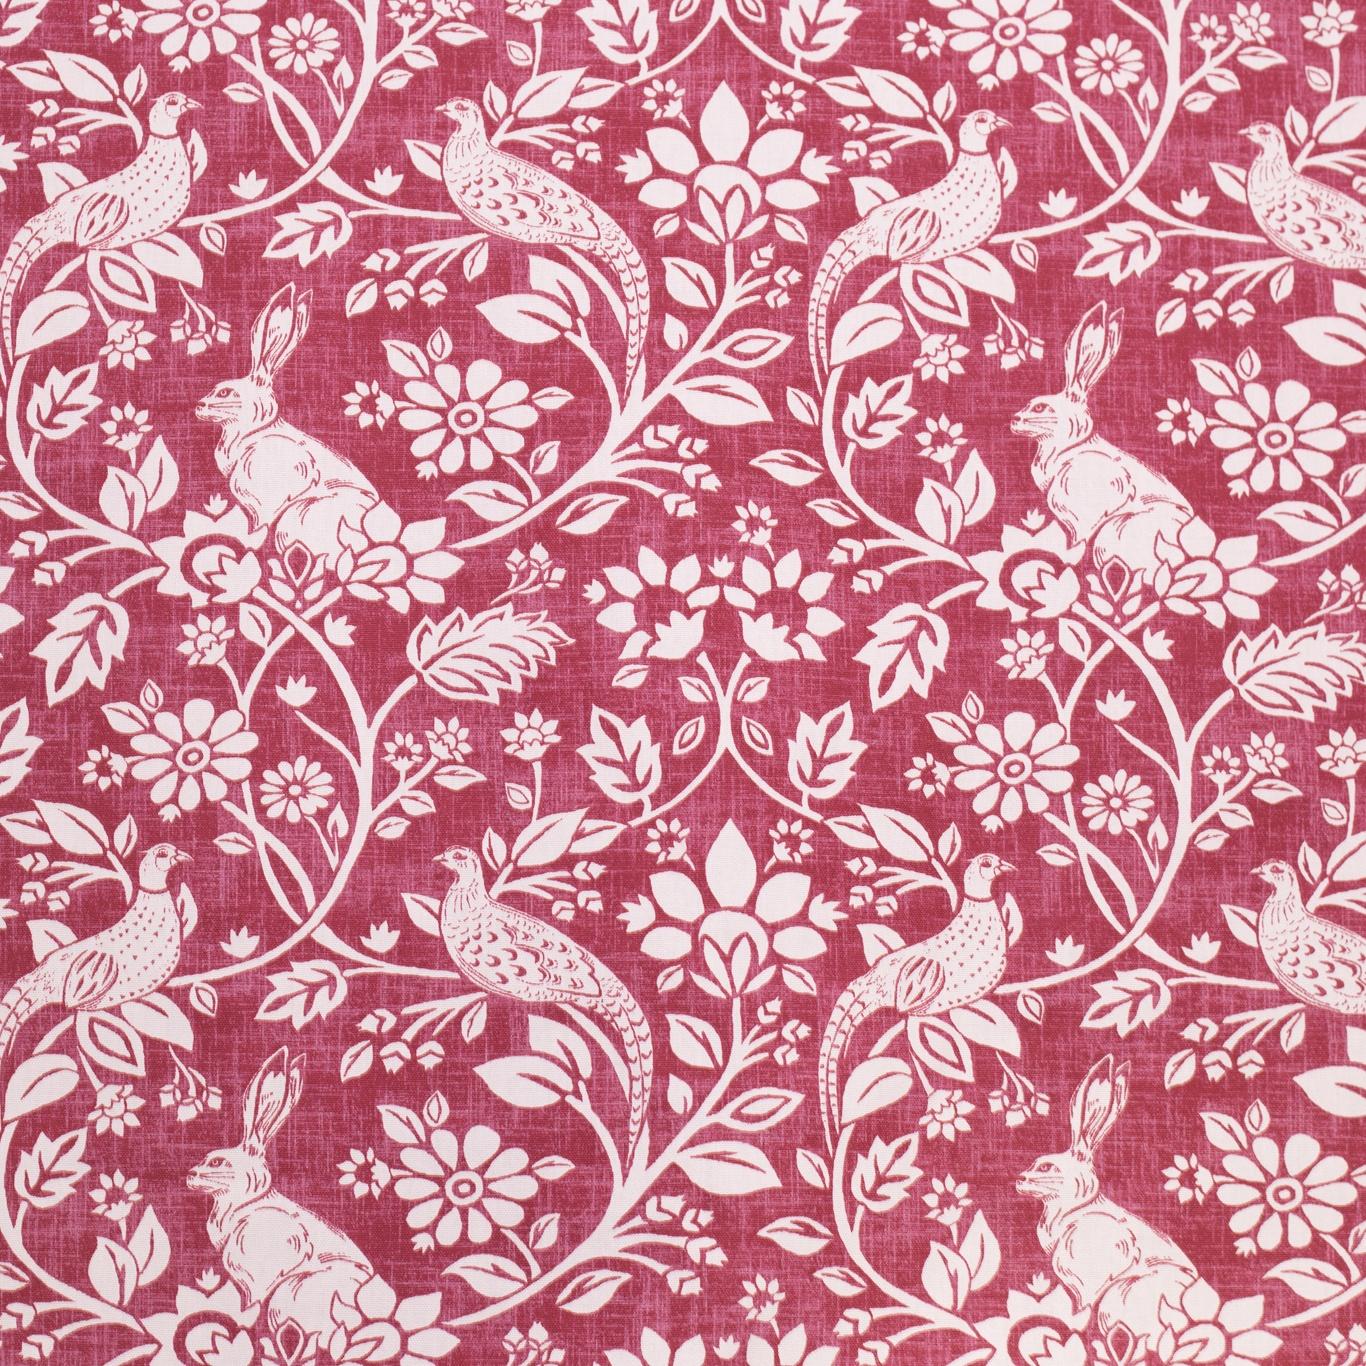 Image of Swatch Box Heathland Rouge Curtain Fabric